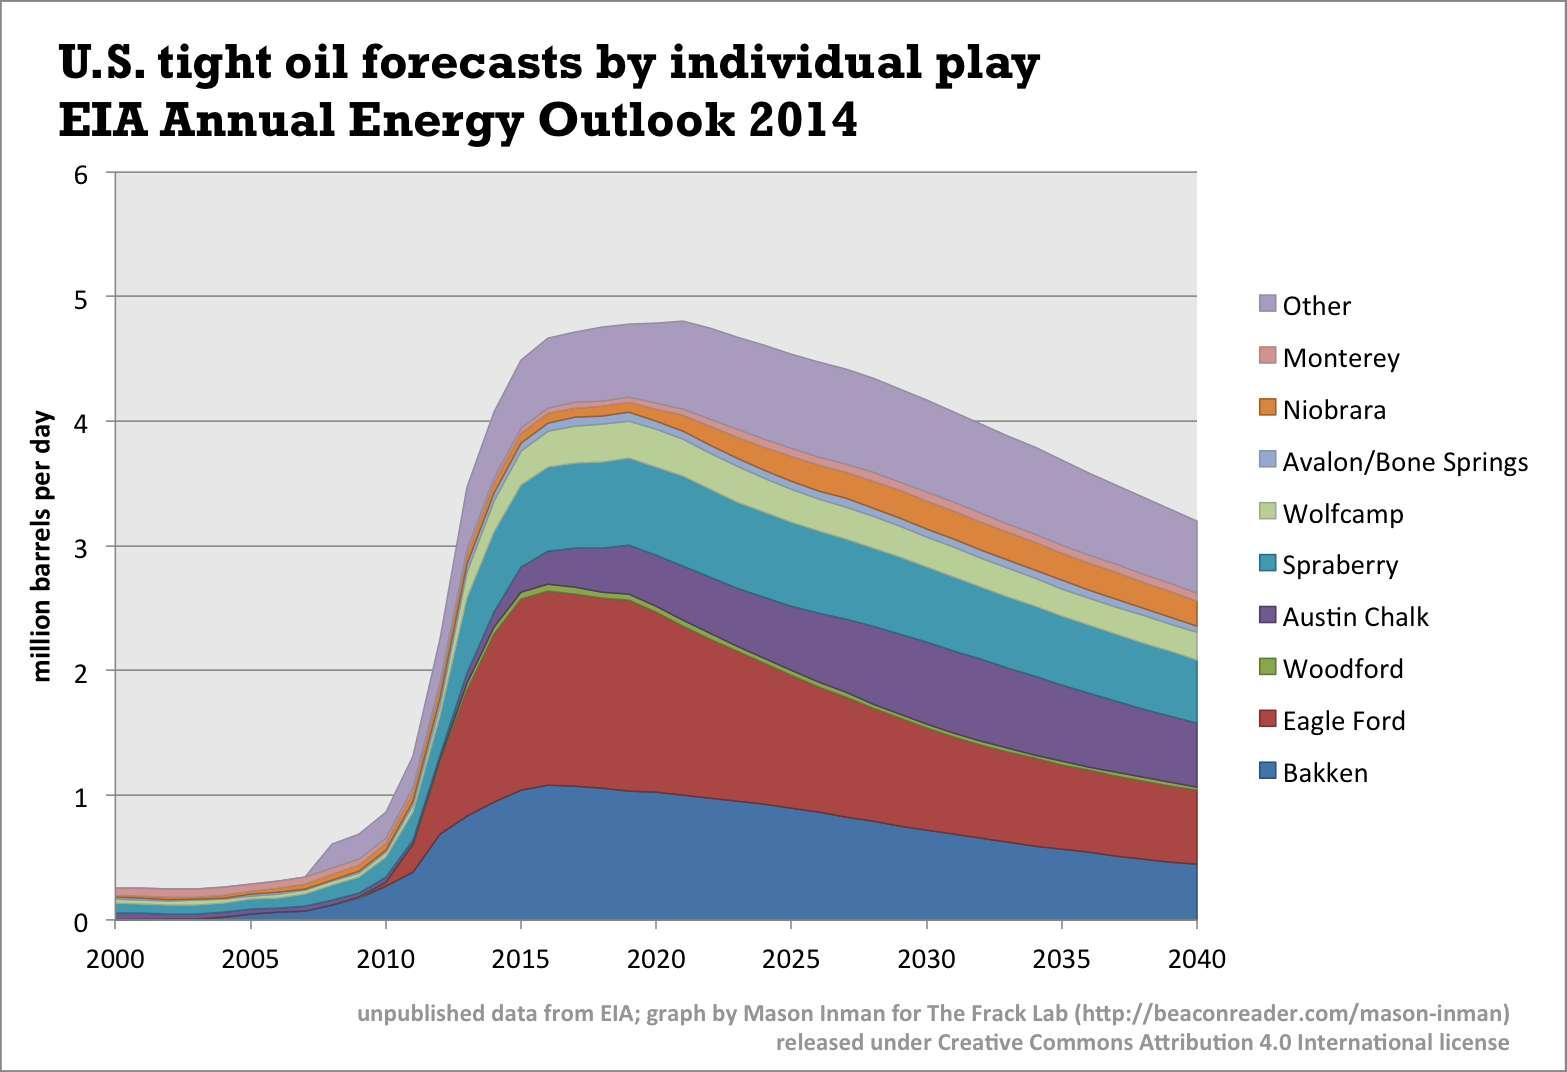 Chart by Mason Inman, using unpublished EIA data